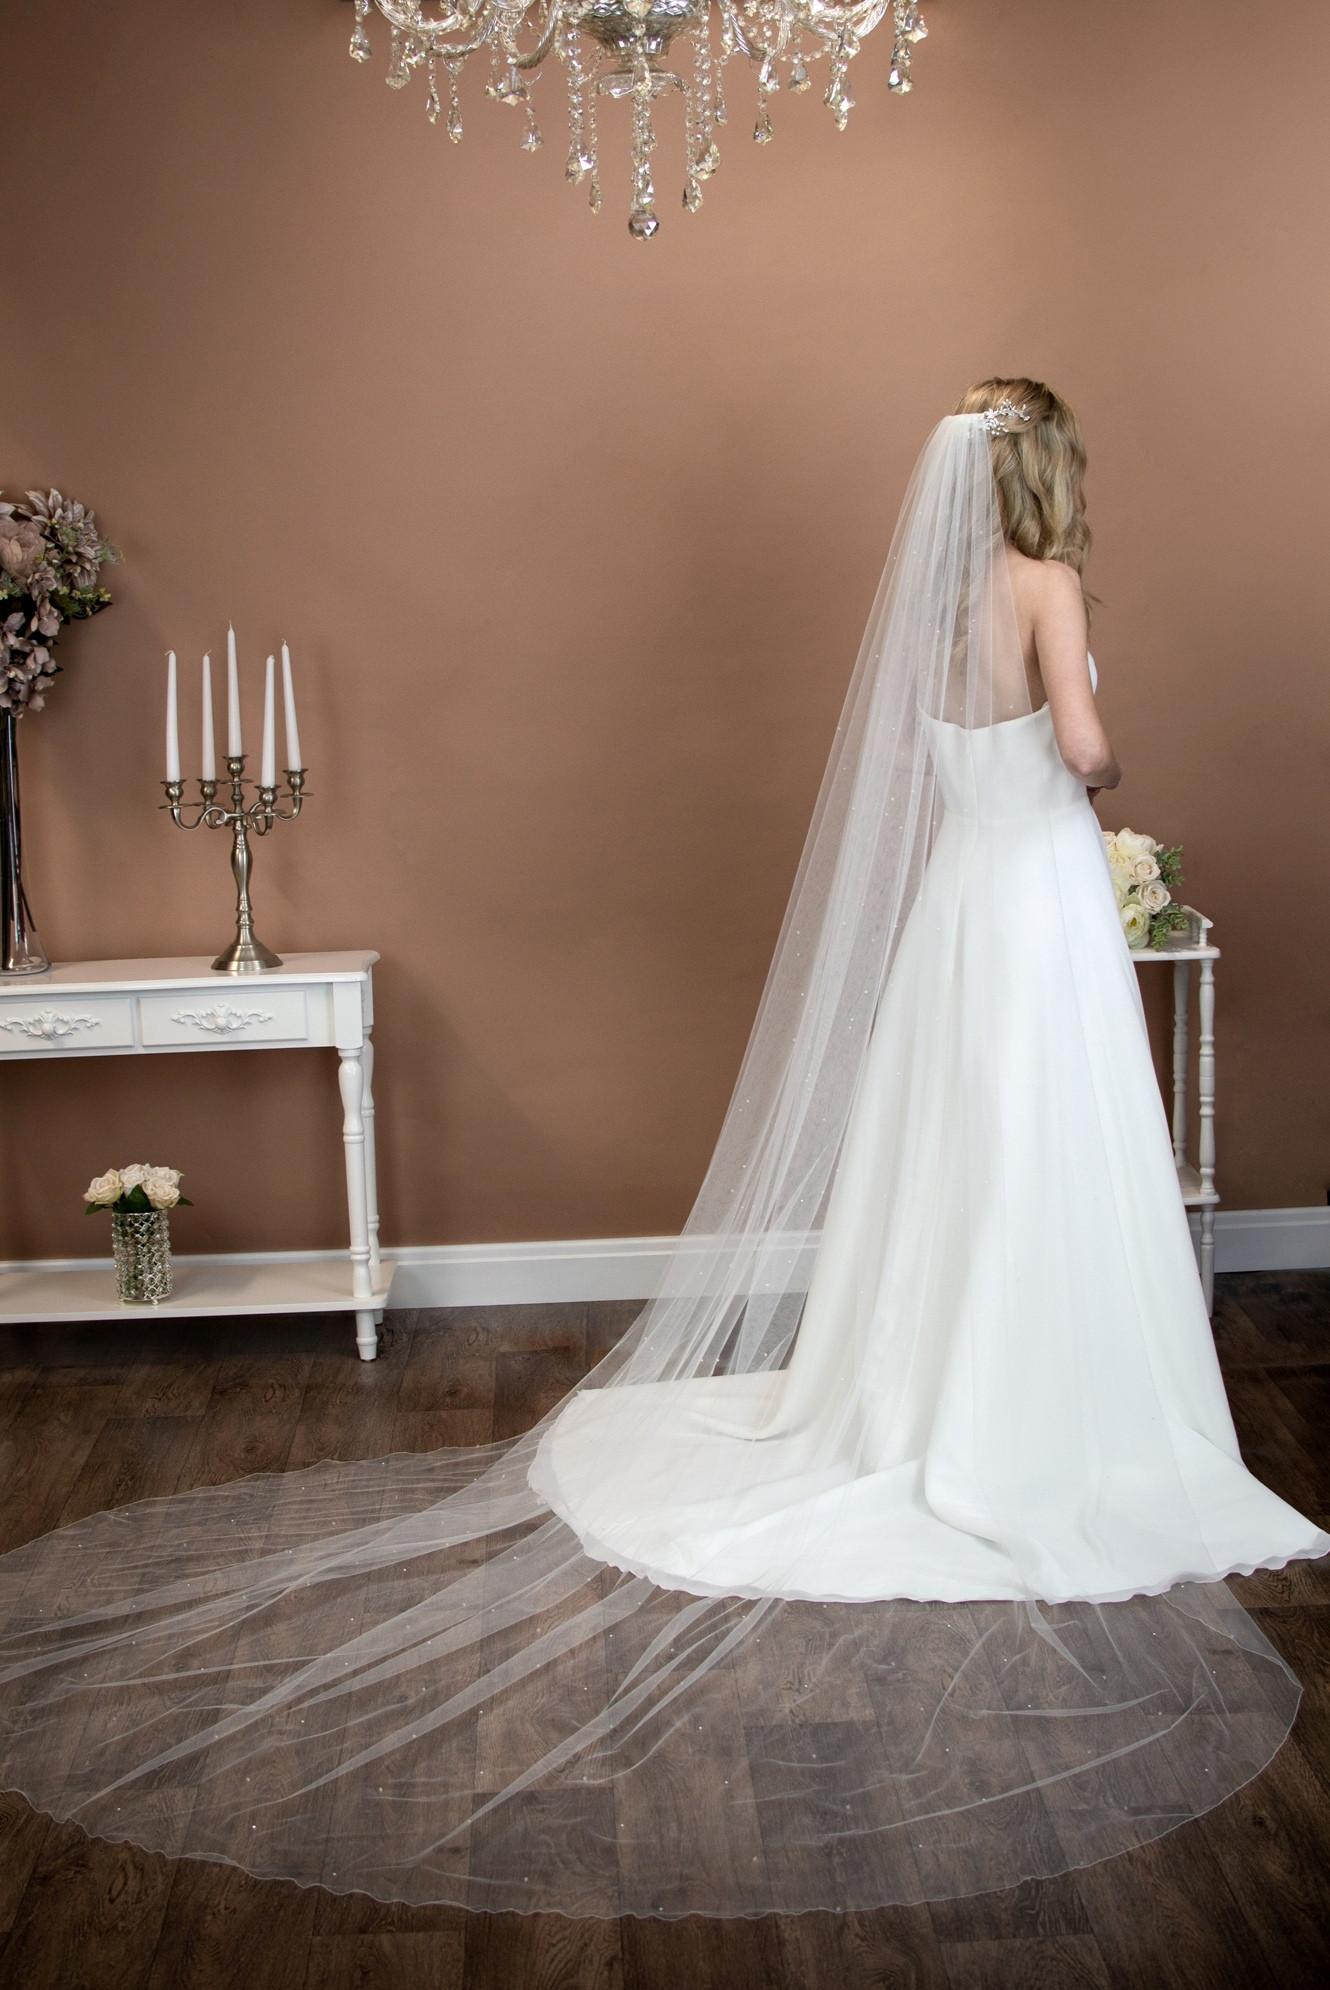 Uk Wedding Veils  The Wedding Veil Shop Wedding Veil Lengths Styles for